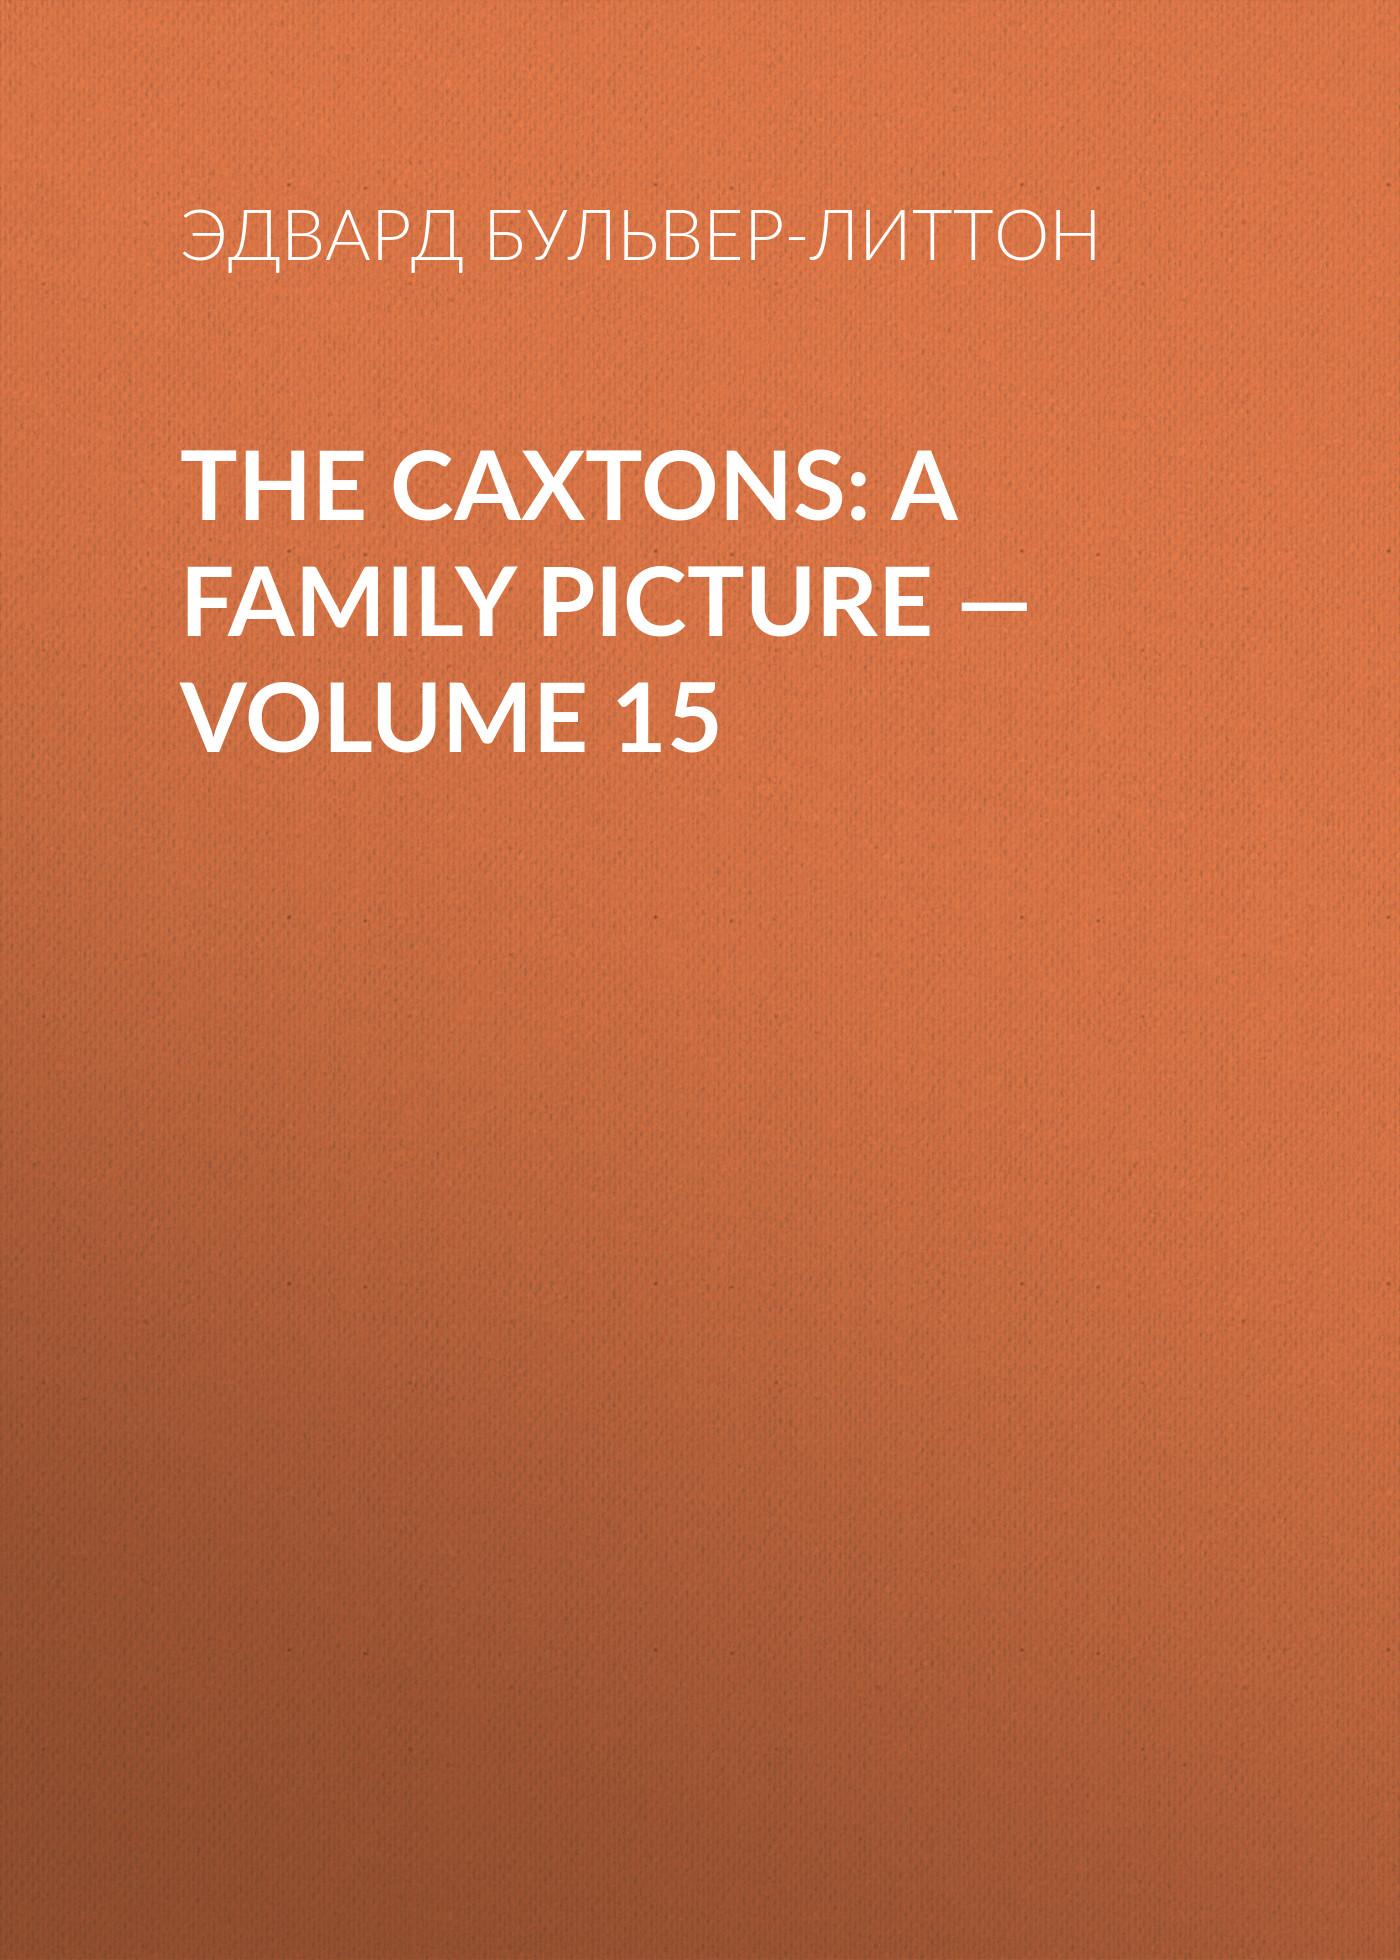 The Caxtons: A Family Picture — Volume 15 ( Эдвард Бульвер-Литтон  )